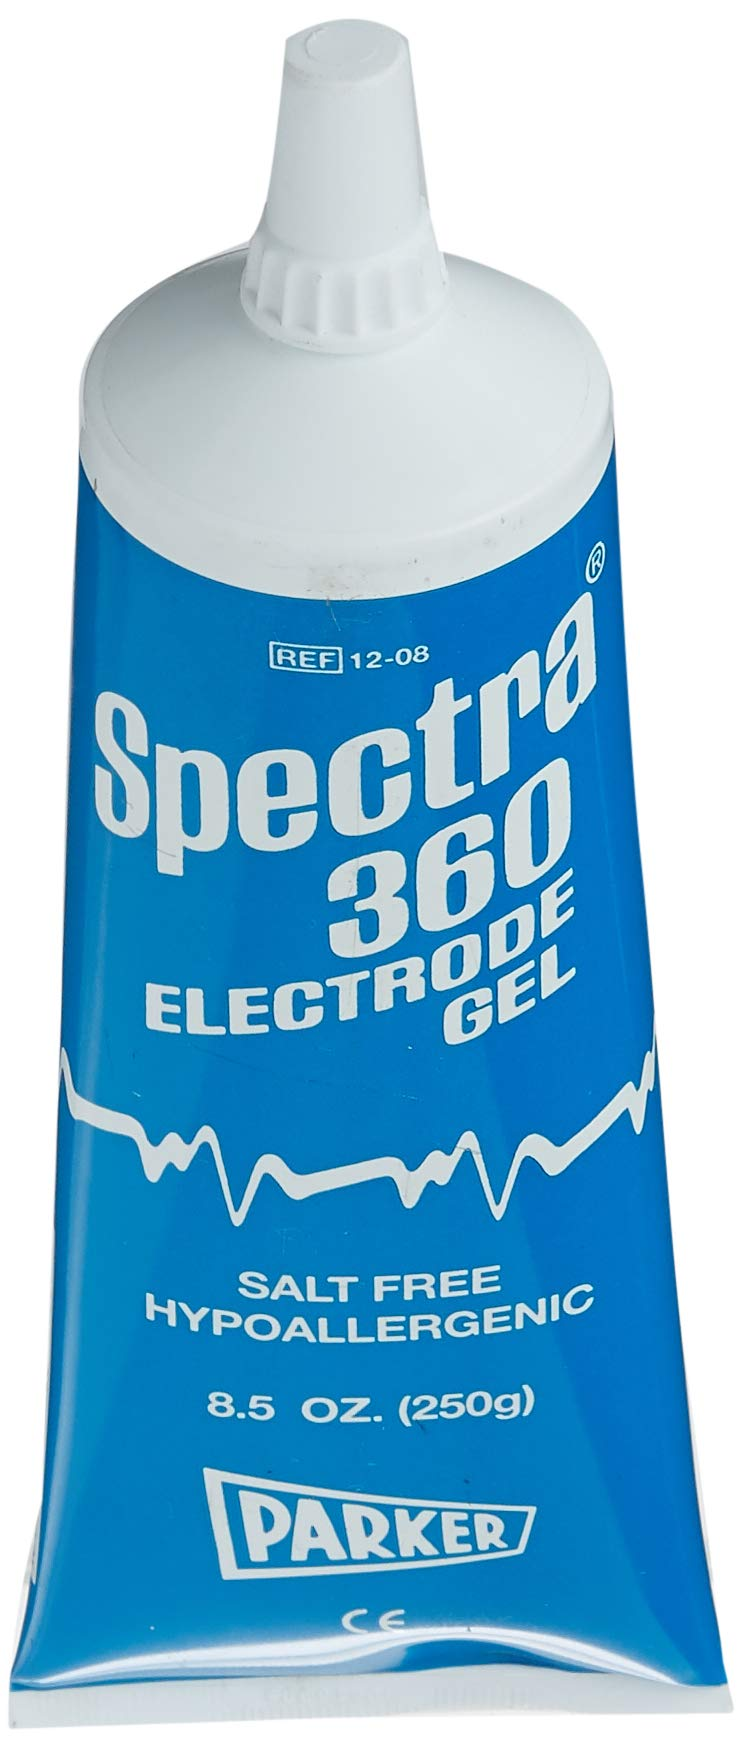 Spectra 360 Electrode Gel